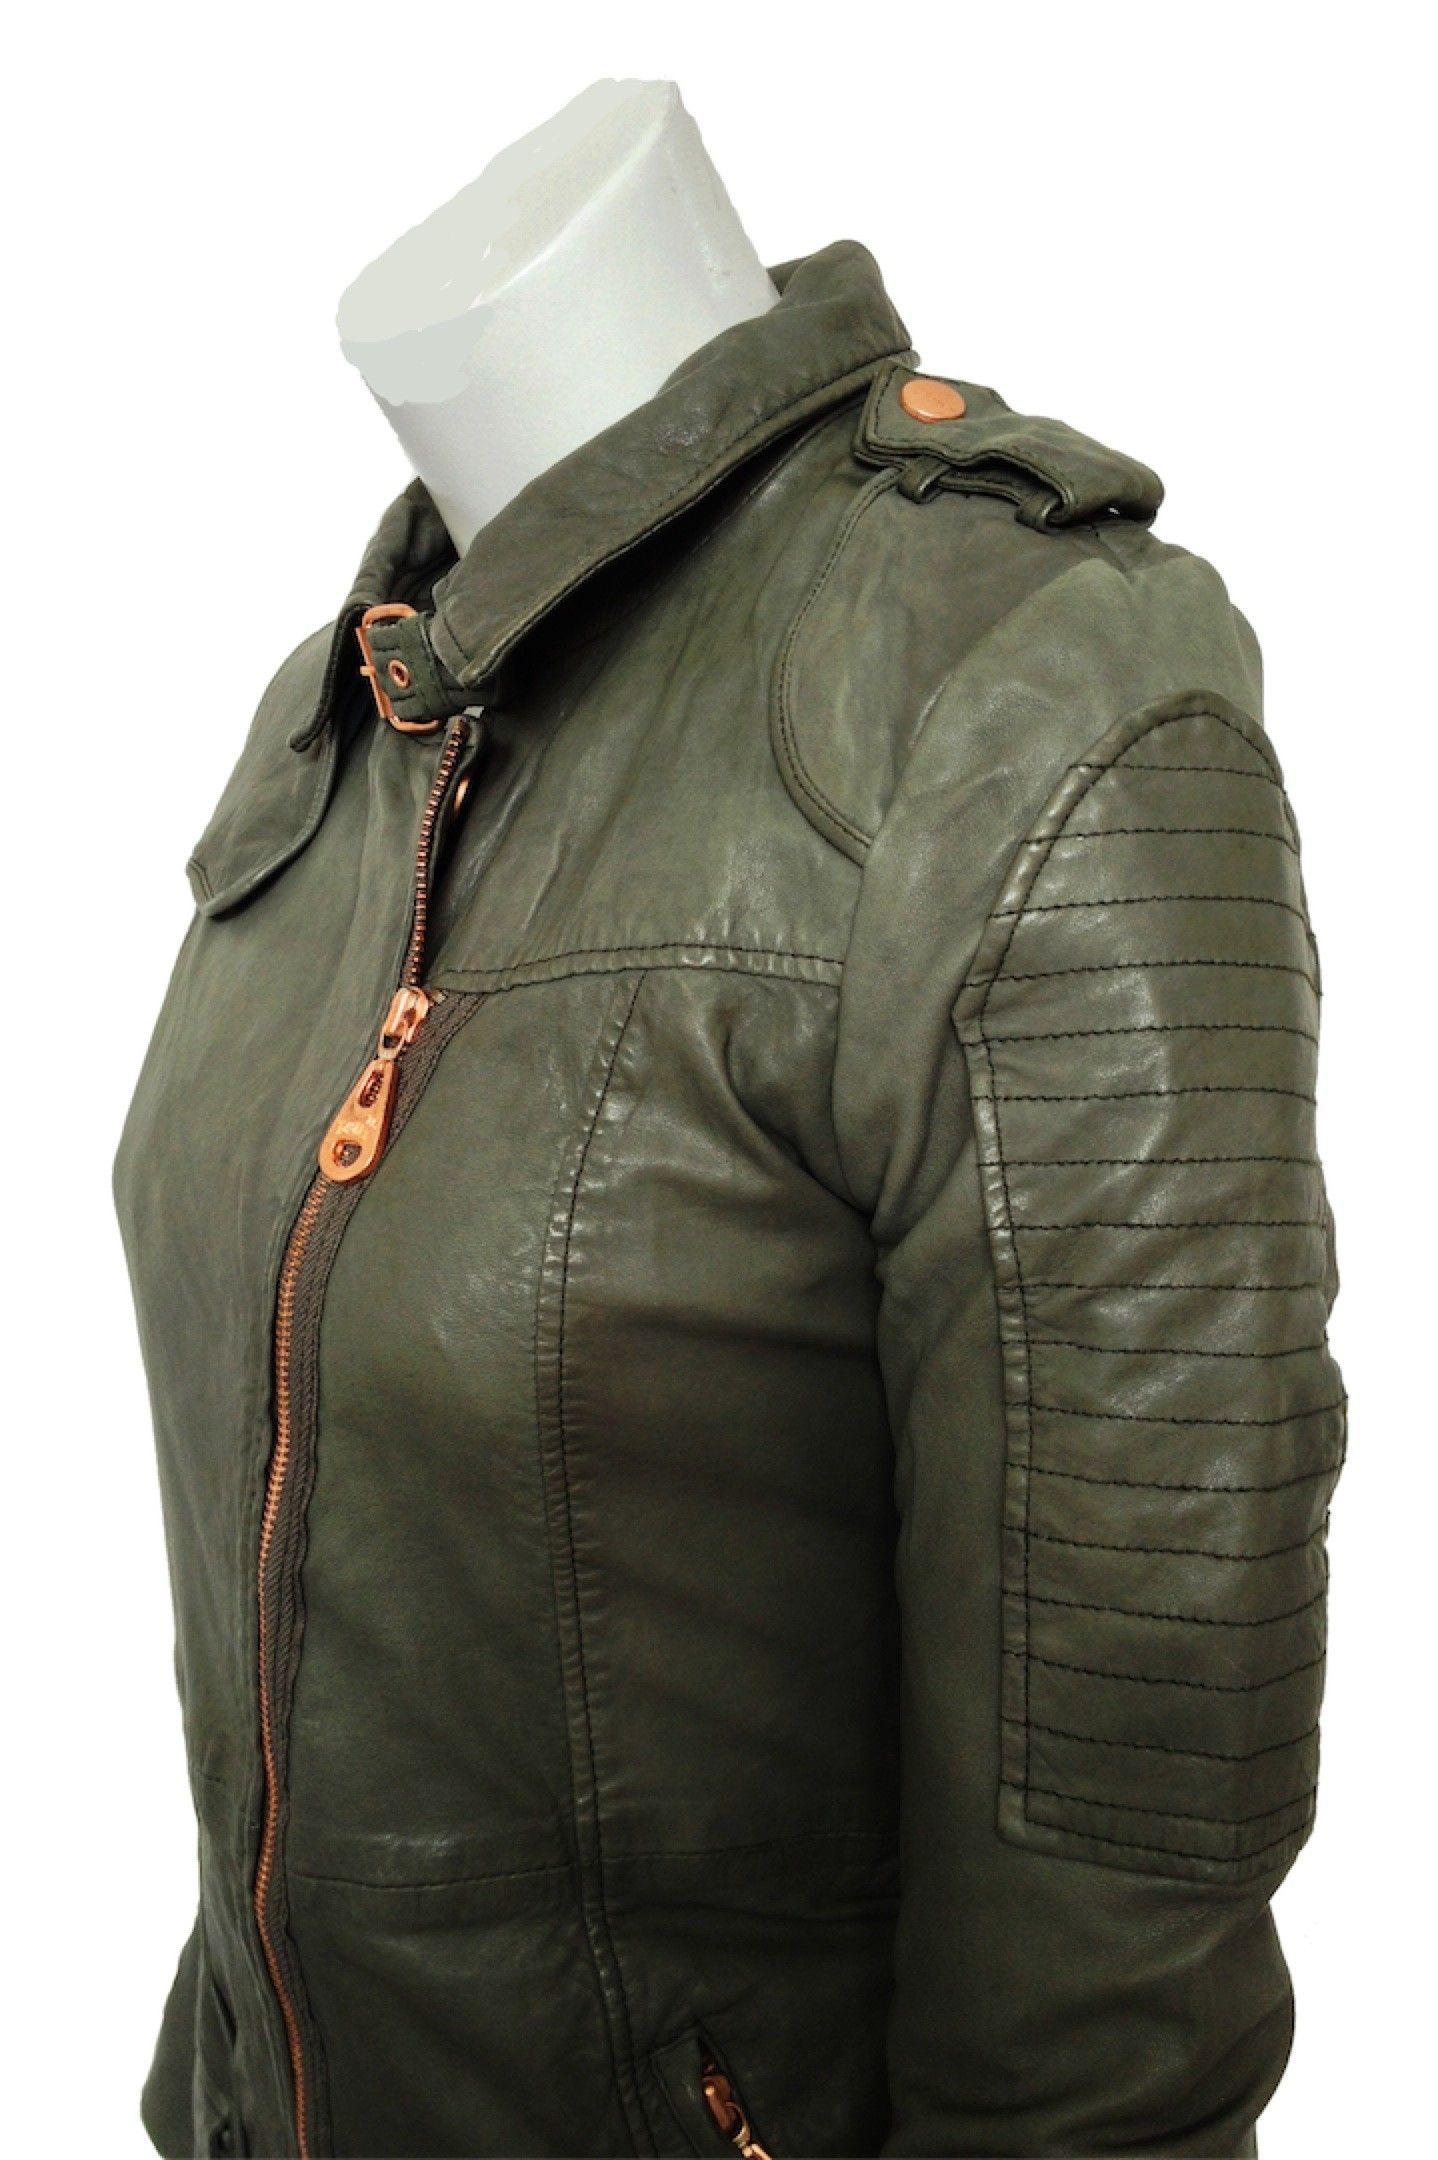 MANDY - Coats - Doma Leather